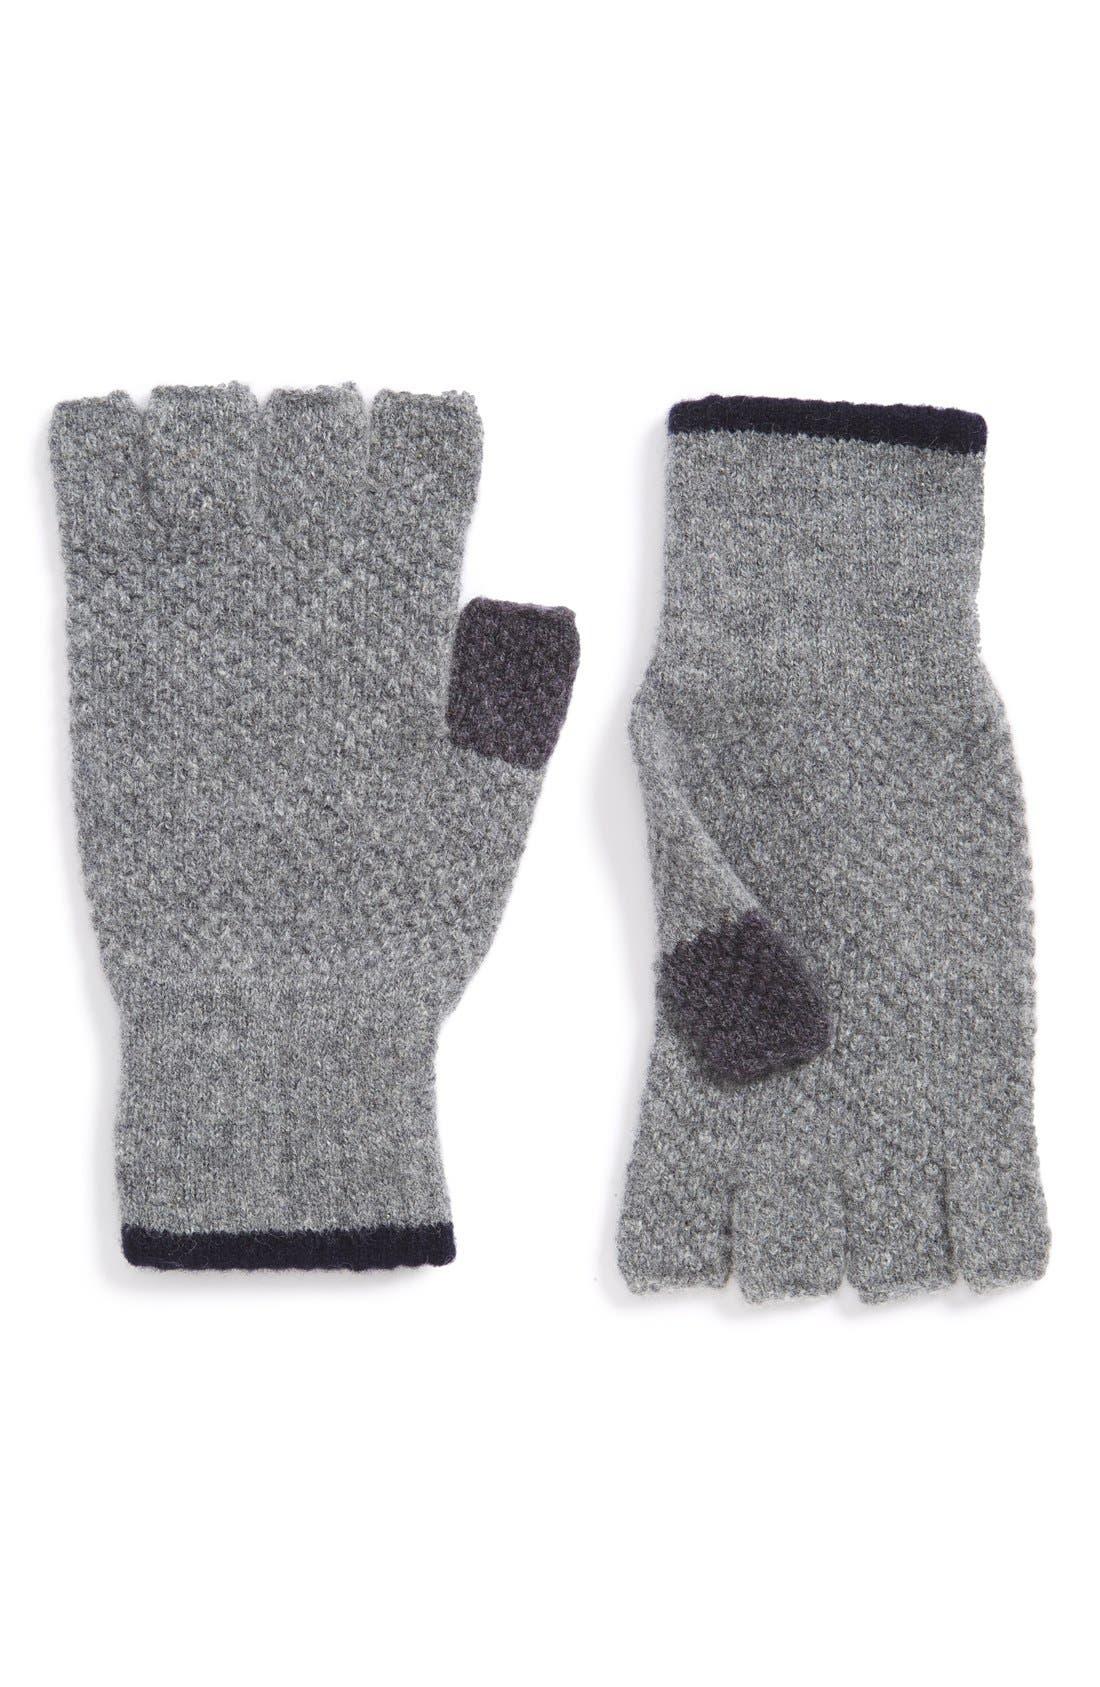 'Canna' Fingerless Wool Gloves,                             Main thumbnail 1, color,                             021